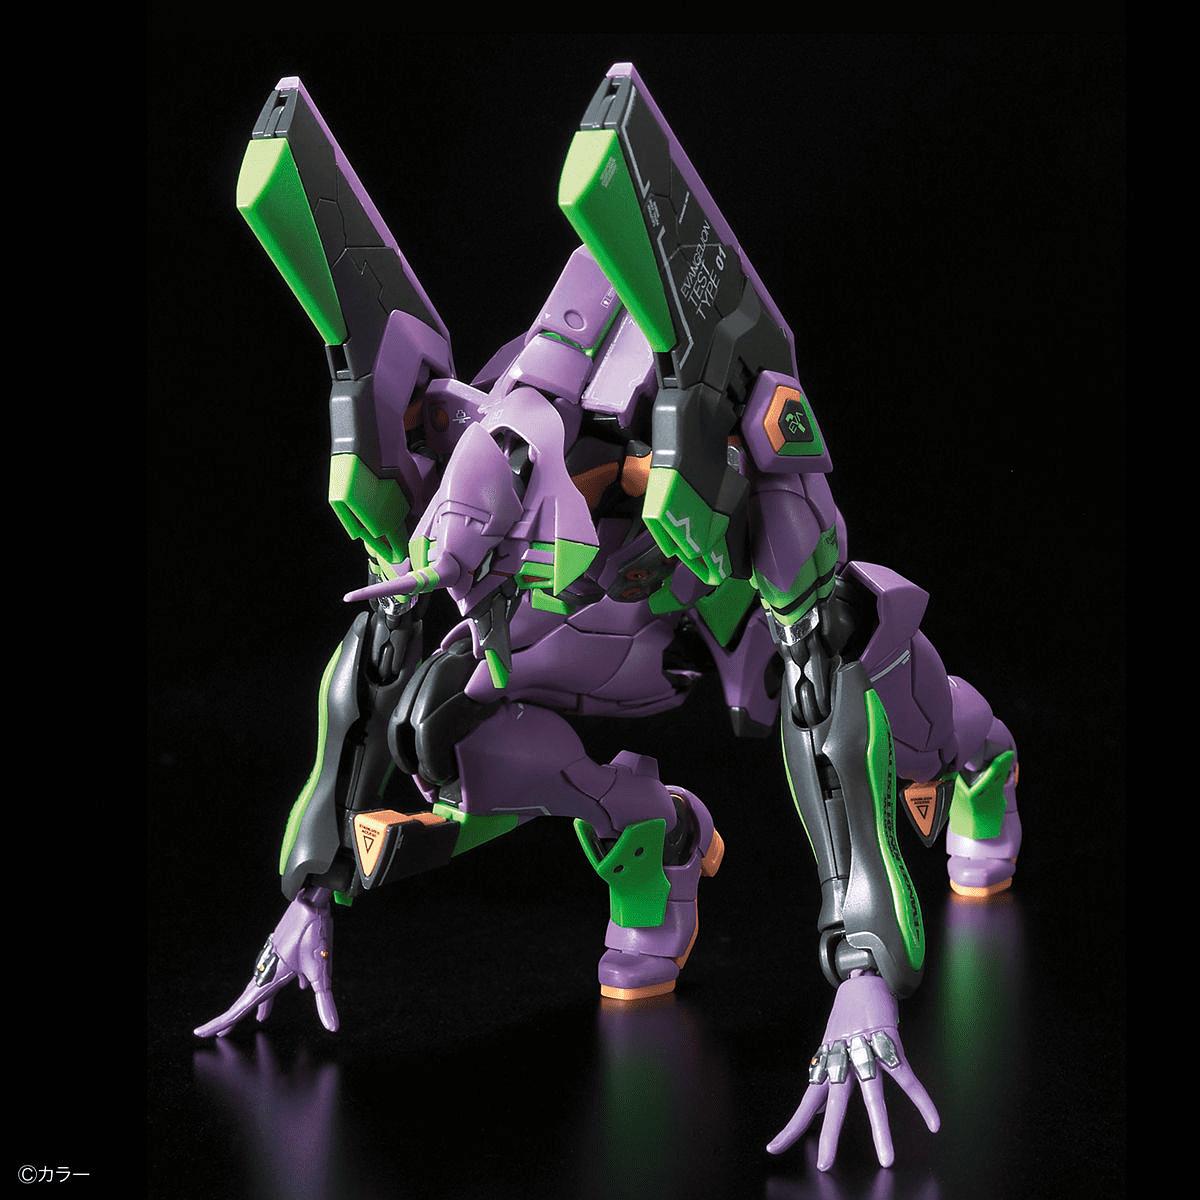 Bandai Real Besoldungsgruppe Rg 1//144 Neon Genesis Evangelion Eva Unit-01